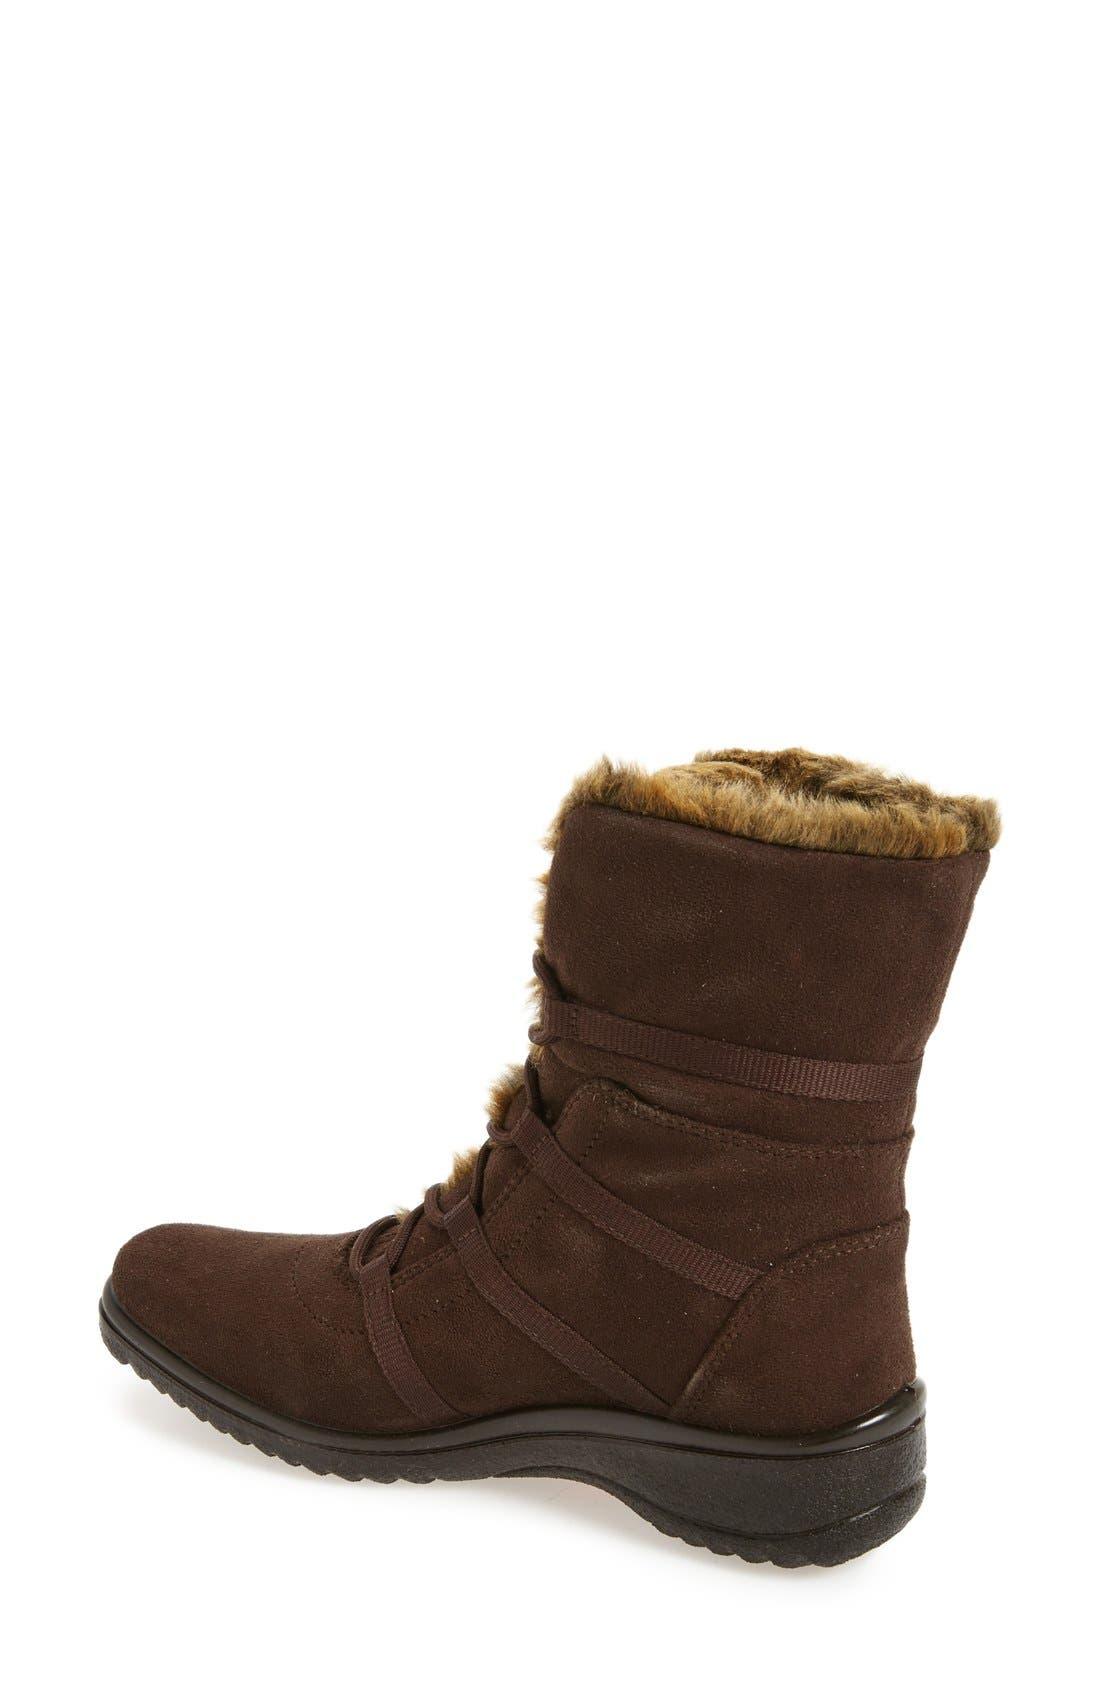 3fde7652418 Women's Ara Shoes | Nordstrom